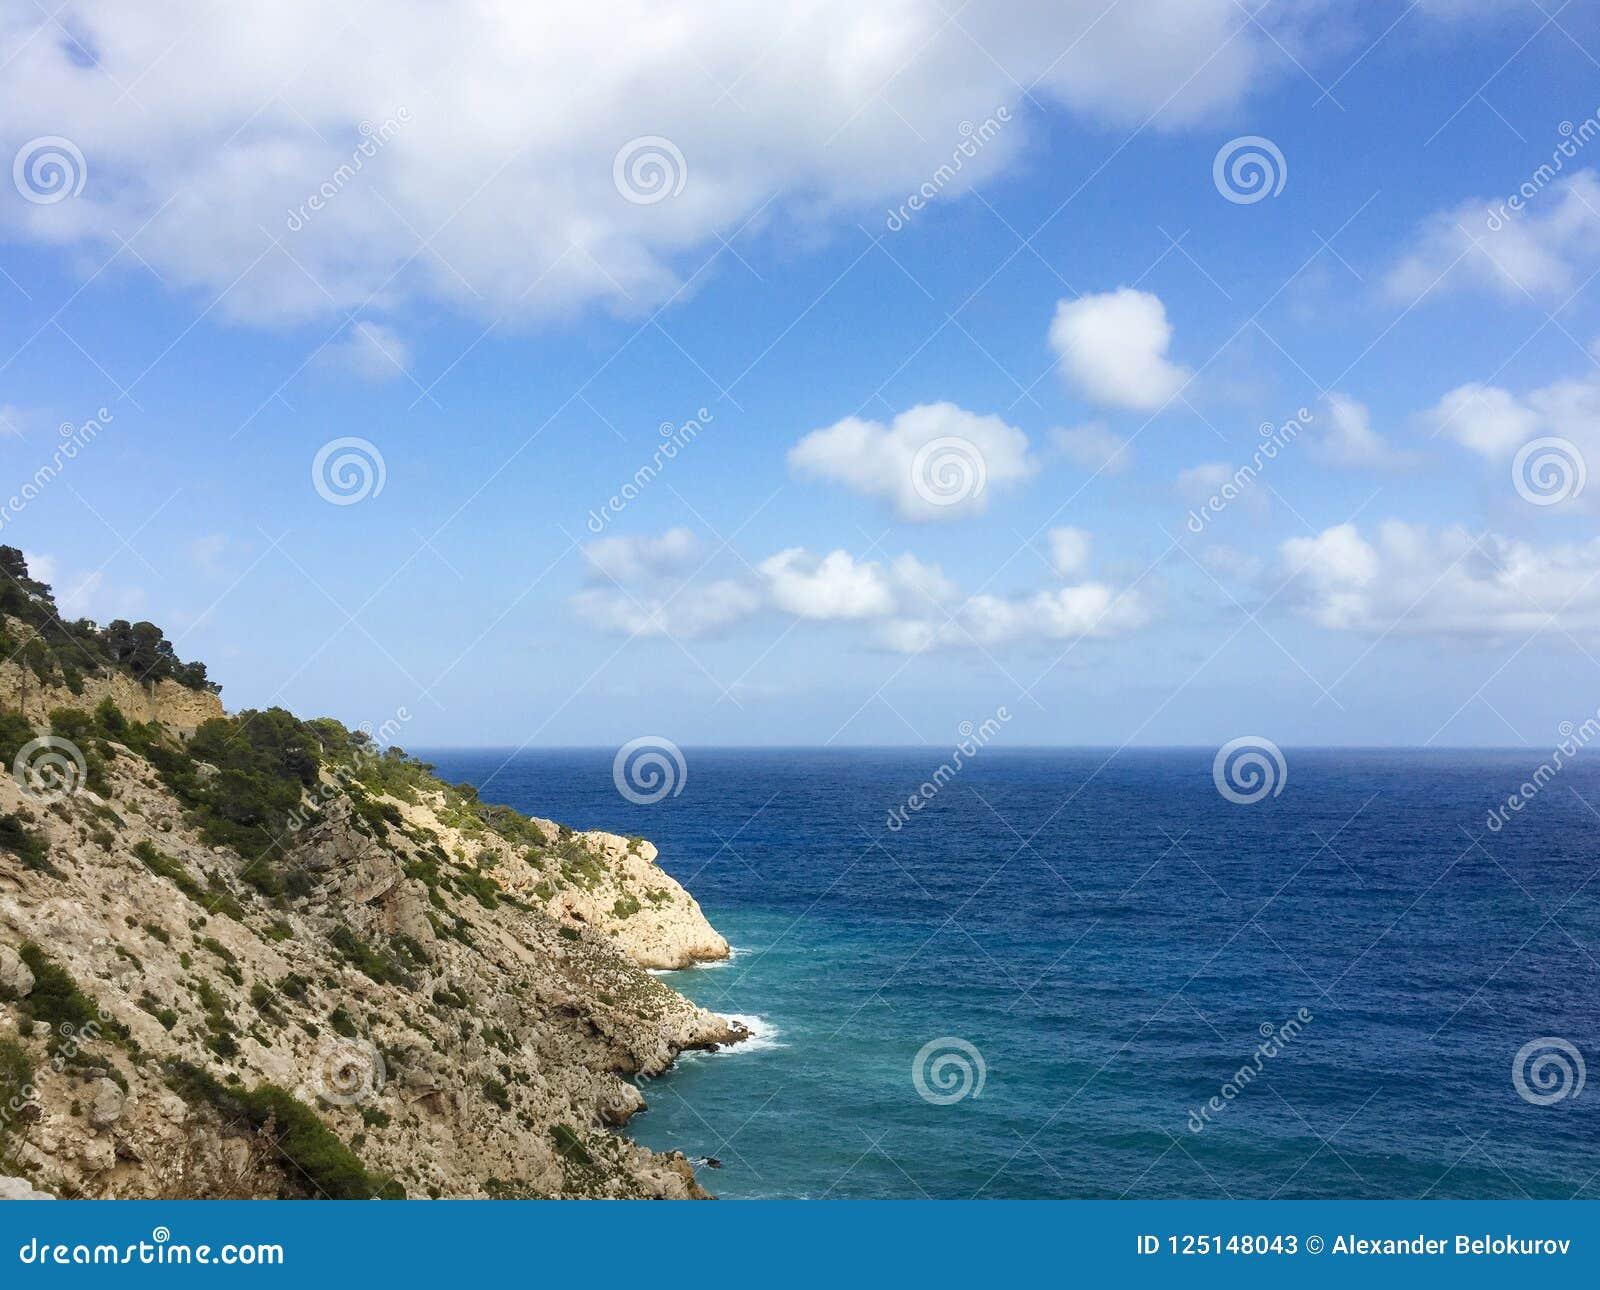 Beautiful Sea And Rocks Vew Over Horizon In Cala Llonga Bay